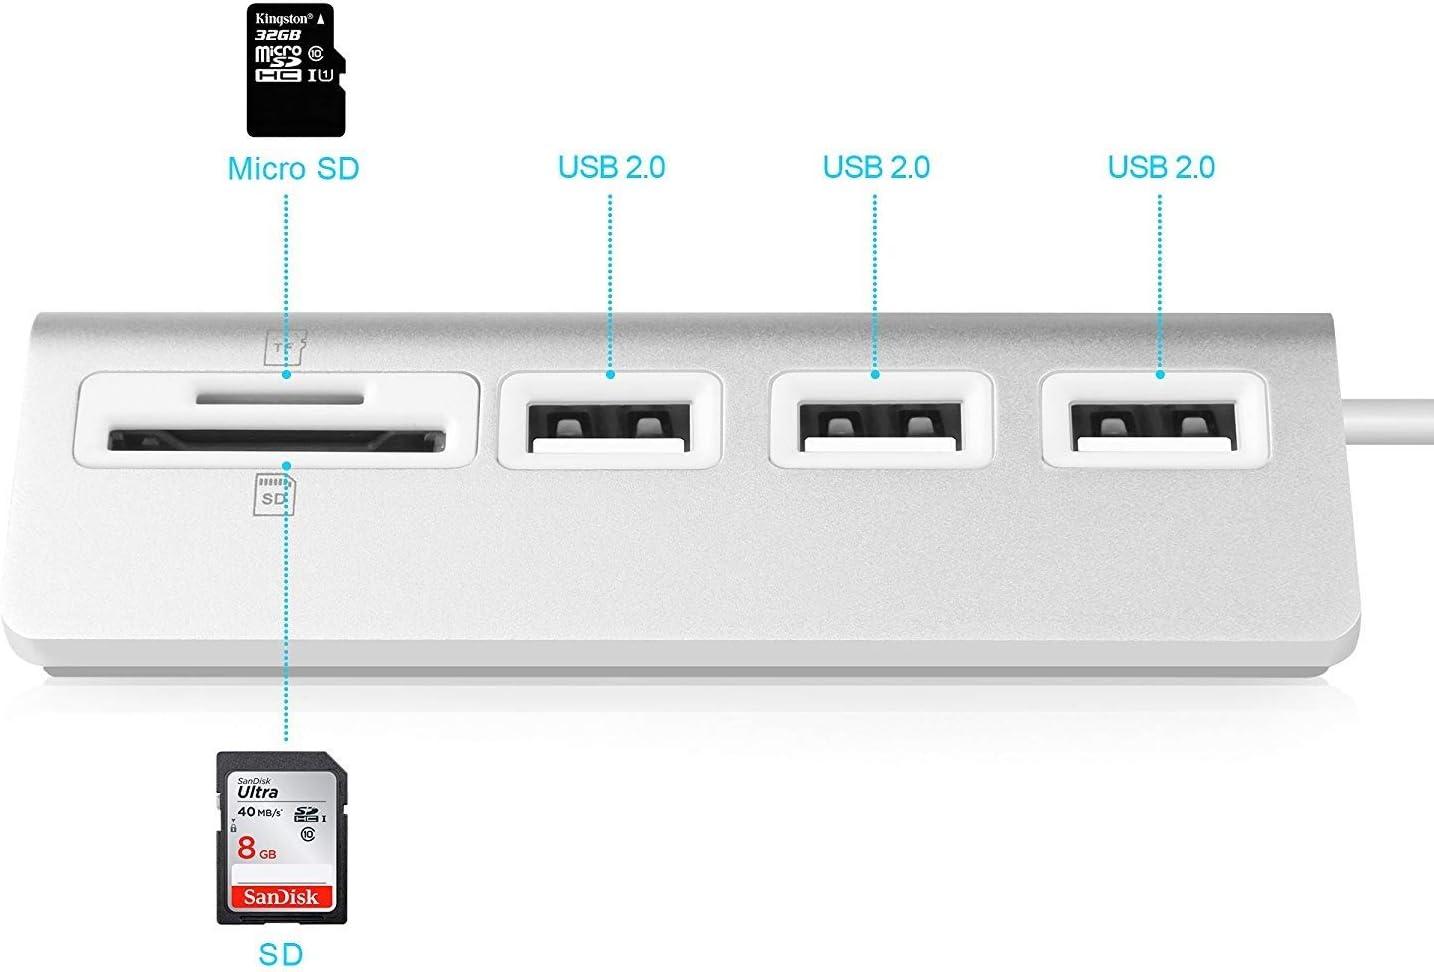 Mac Mini USB 2.0 Hub with SD//TF Card Reader for iMac MacBook Pro MacBook MacBook Air PC and Laptop XLHJFDI USB 2.0 Hub